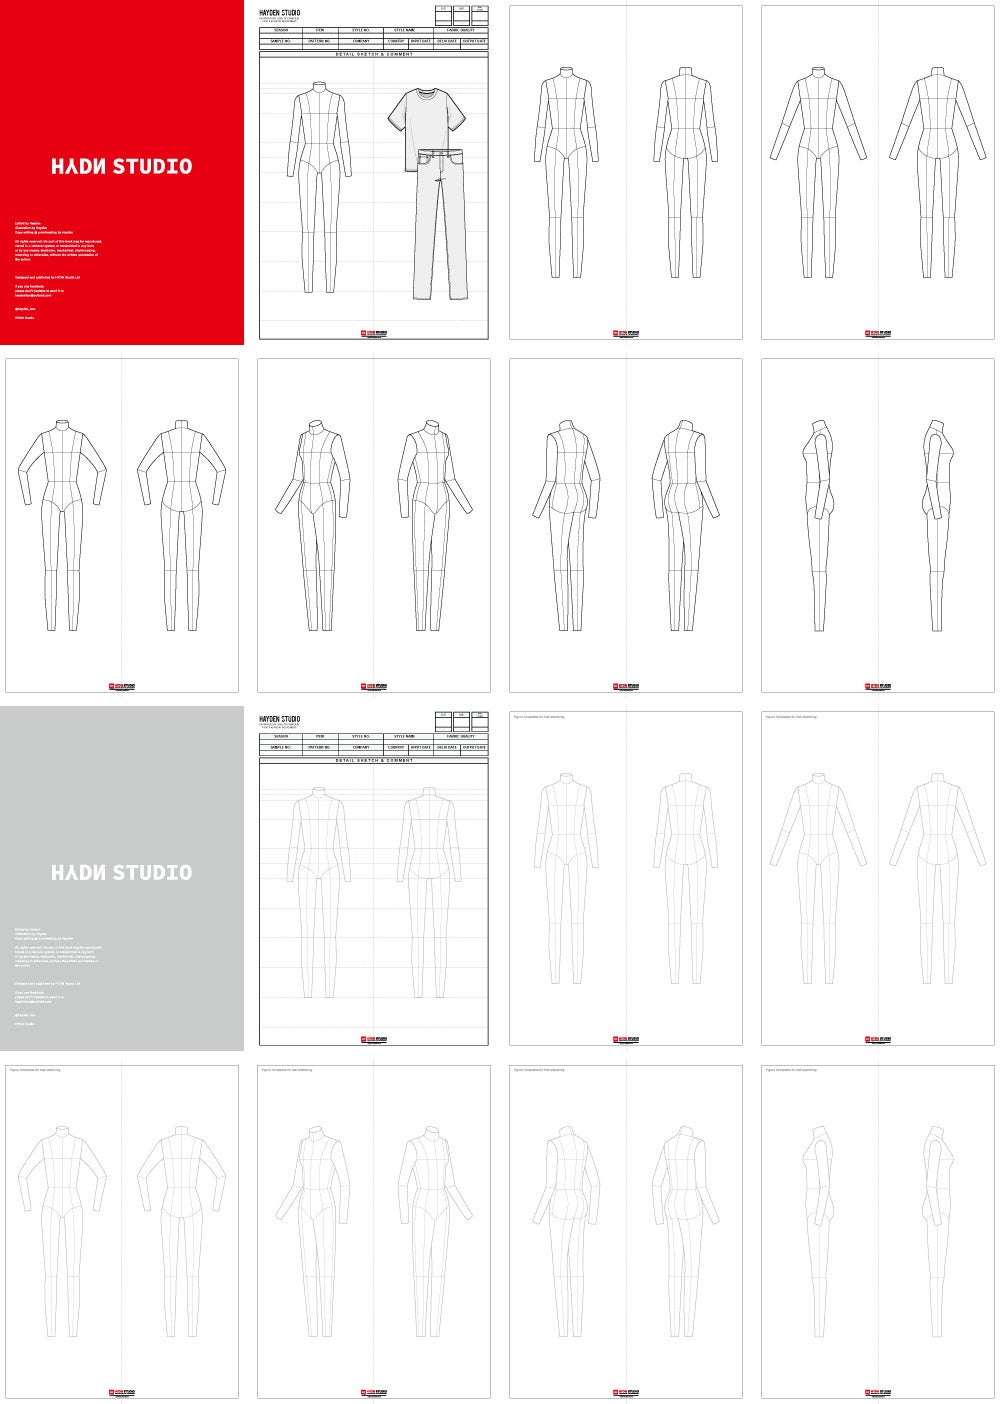 Female Fashion Flats Template Ver2 9head Etsy Fashion Flats Fashion Sketch Template Body Template